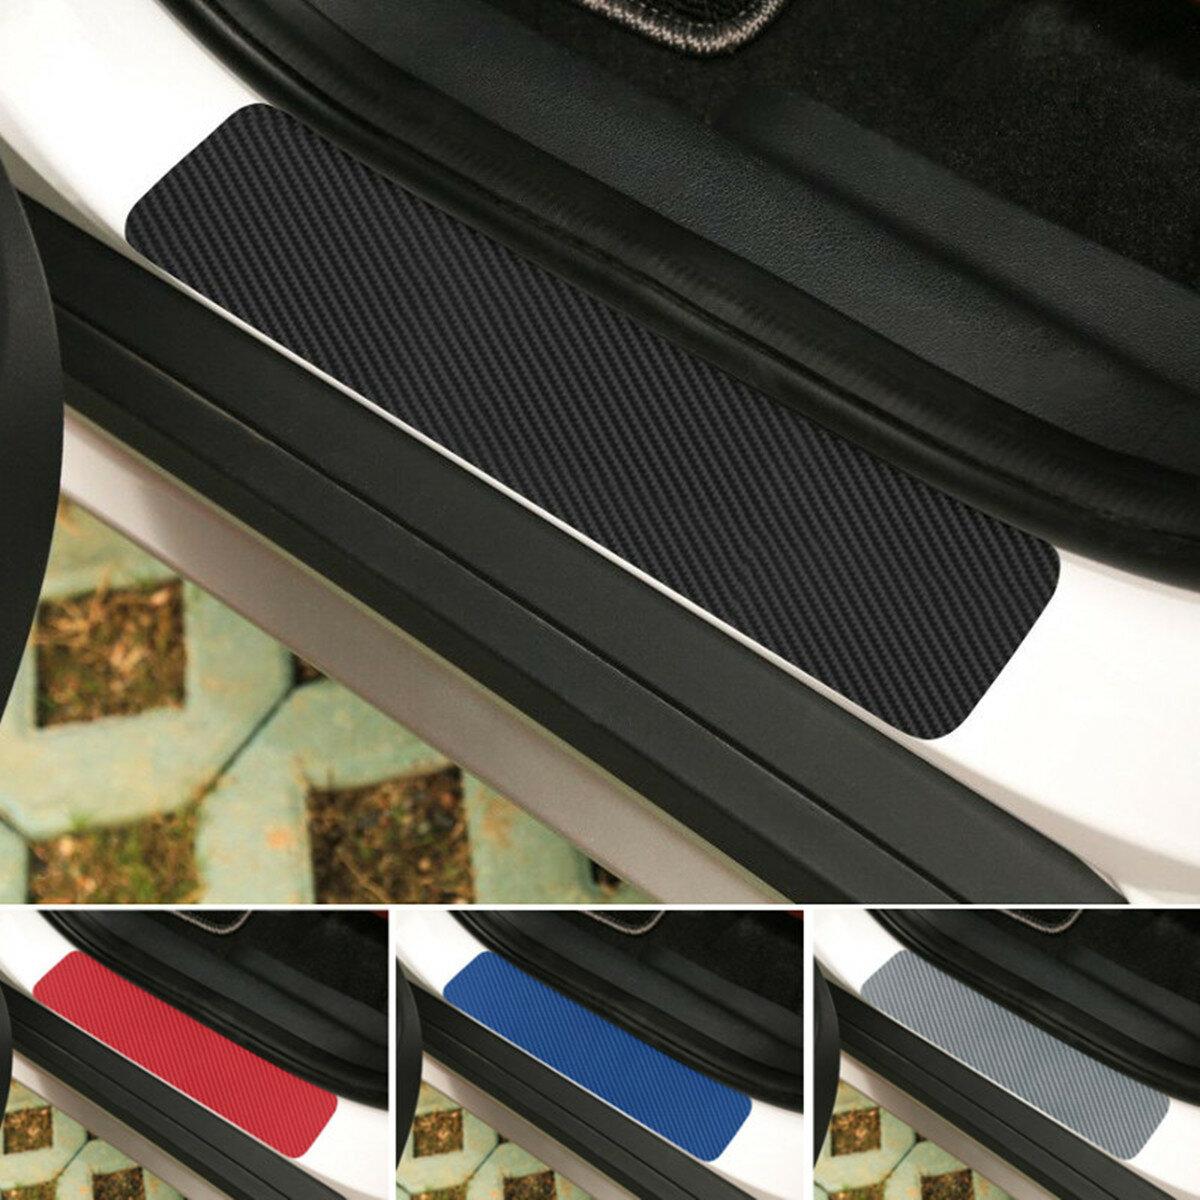 4PCS 3D Carbon Fiber Anti-scratch Waterproof Car Stickers Door Sill Decals Film for Pedal threshold